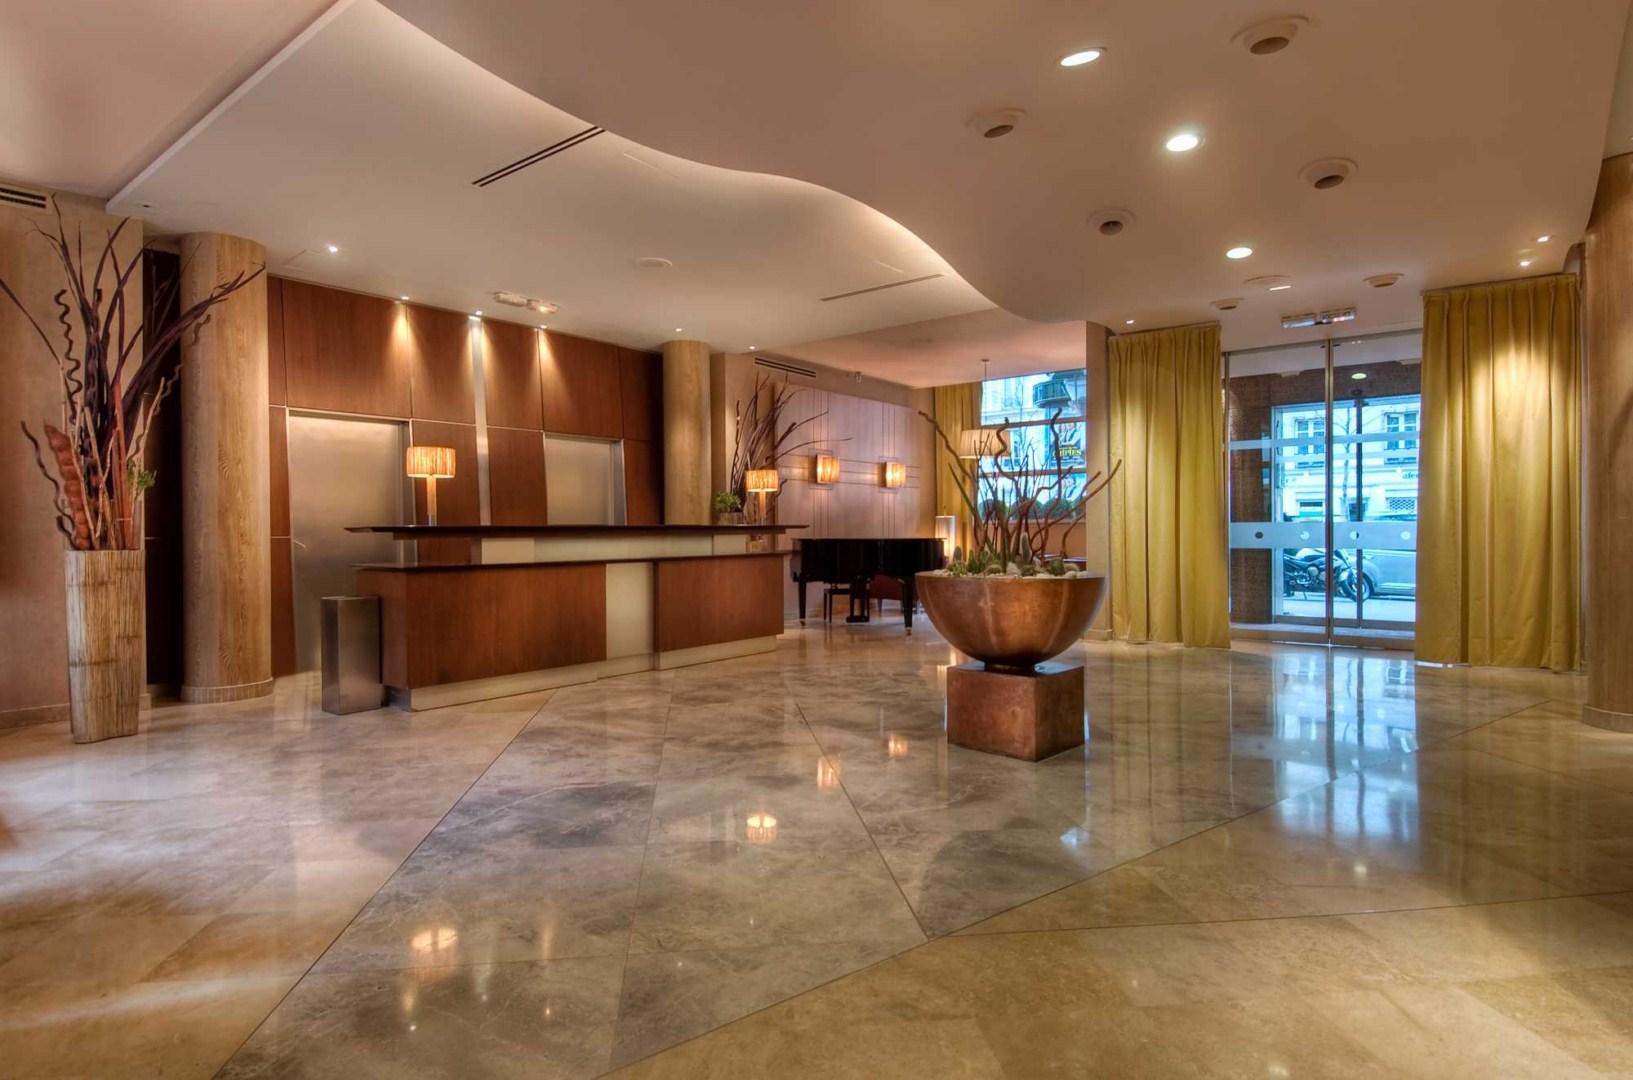 Hotel Ampere - Reception